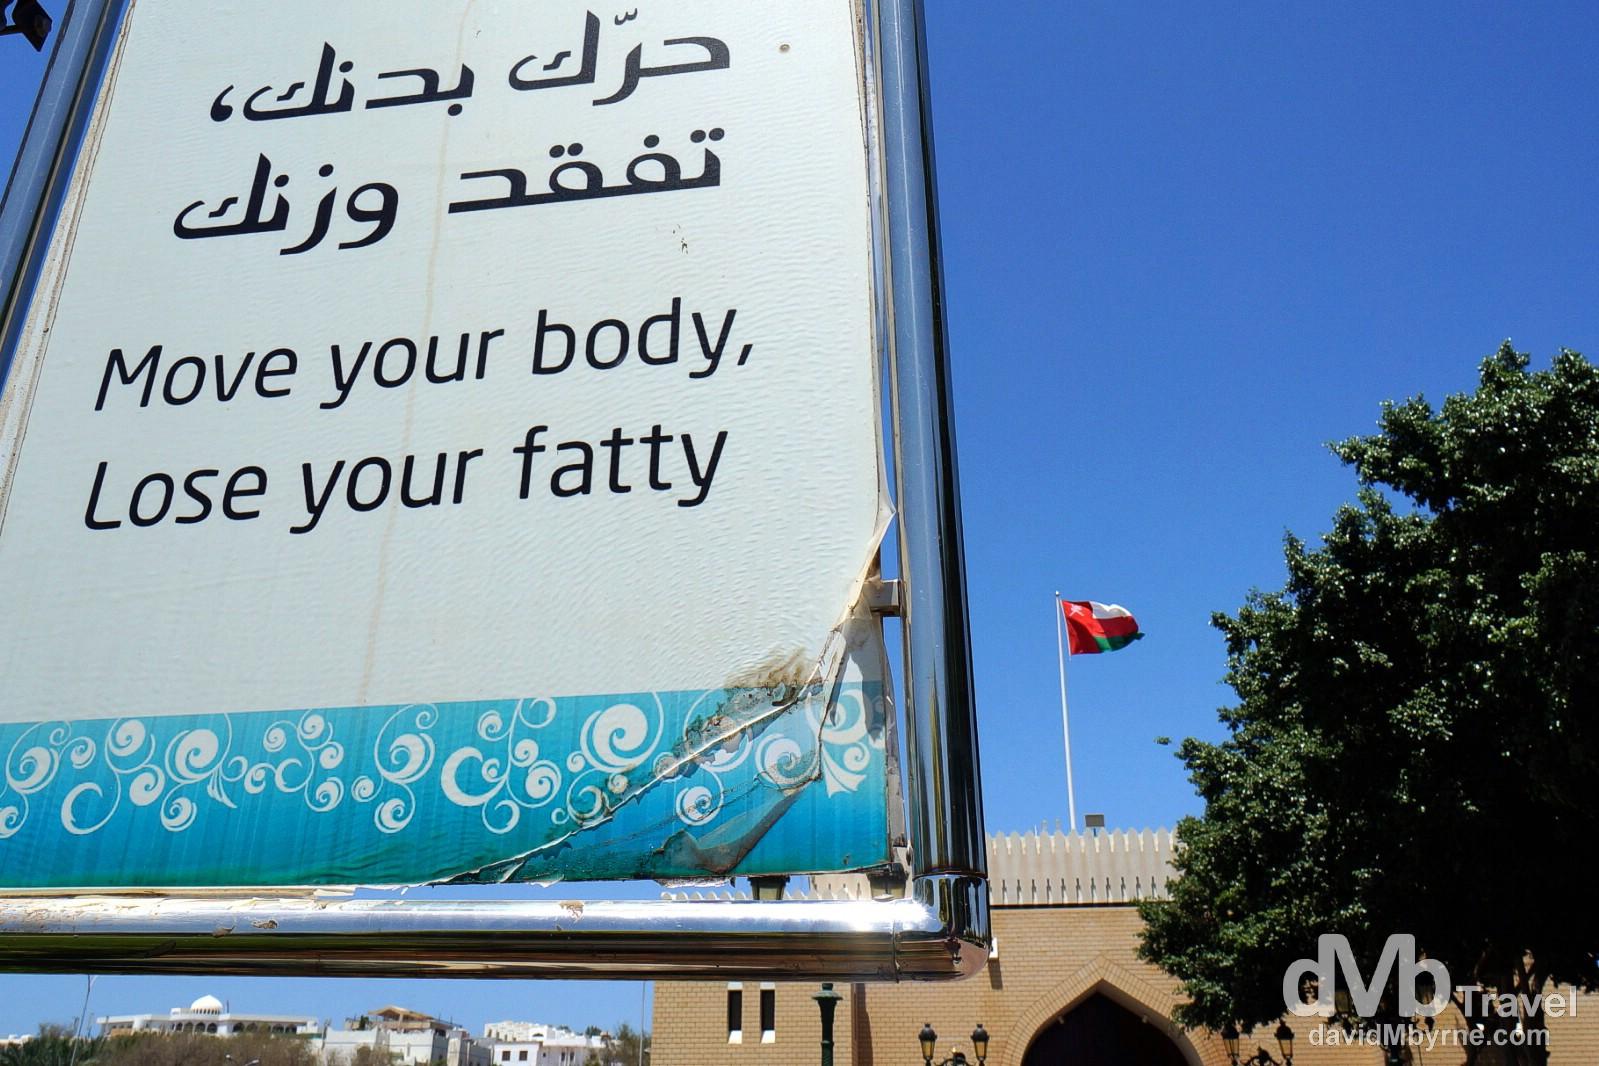 Some good advice from Muscat Municipality in Al Qurm National Park, Al Qurm, Muscat, Oman. April 26th, 2014.